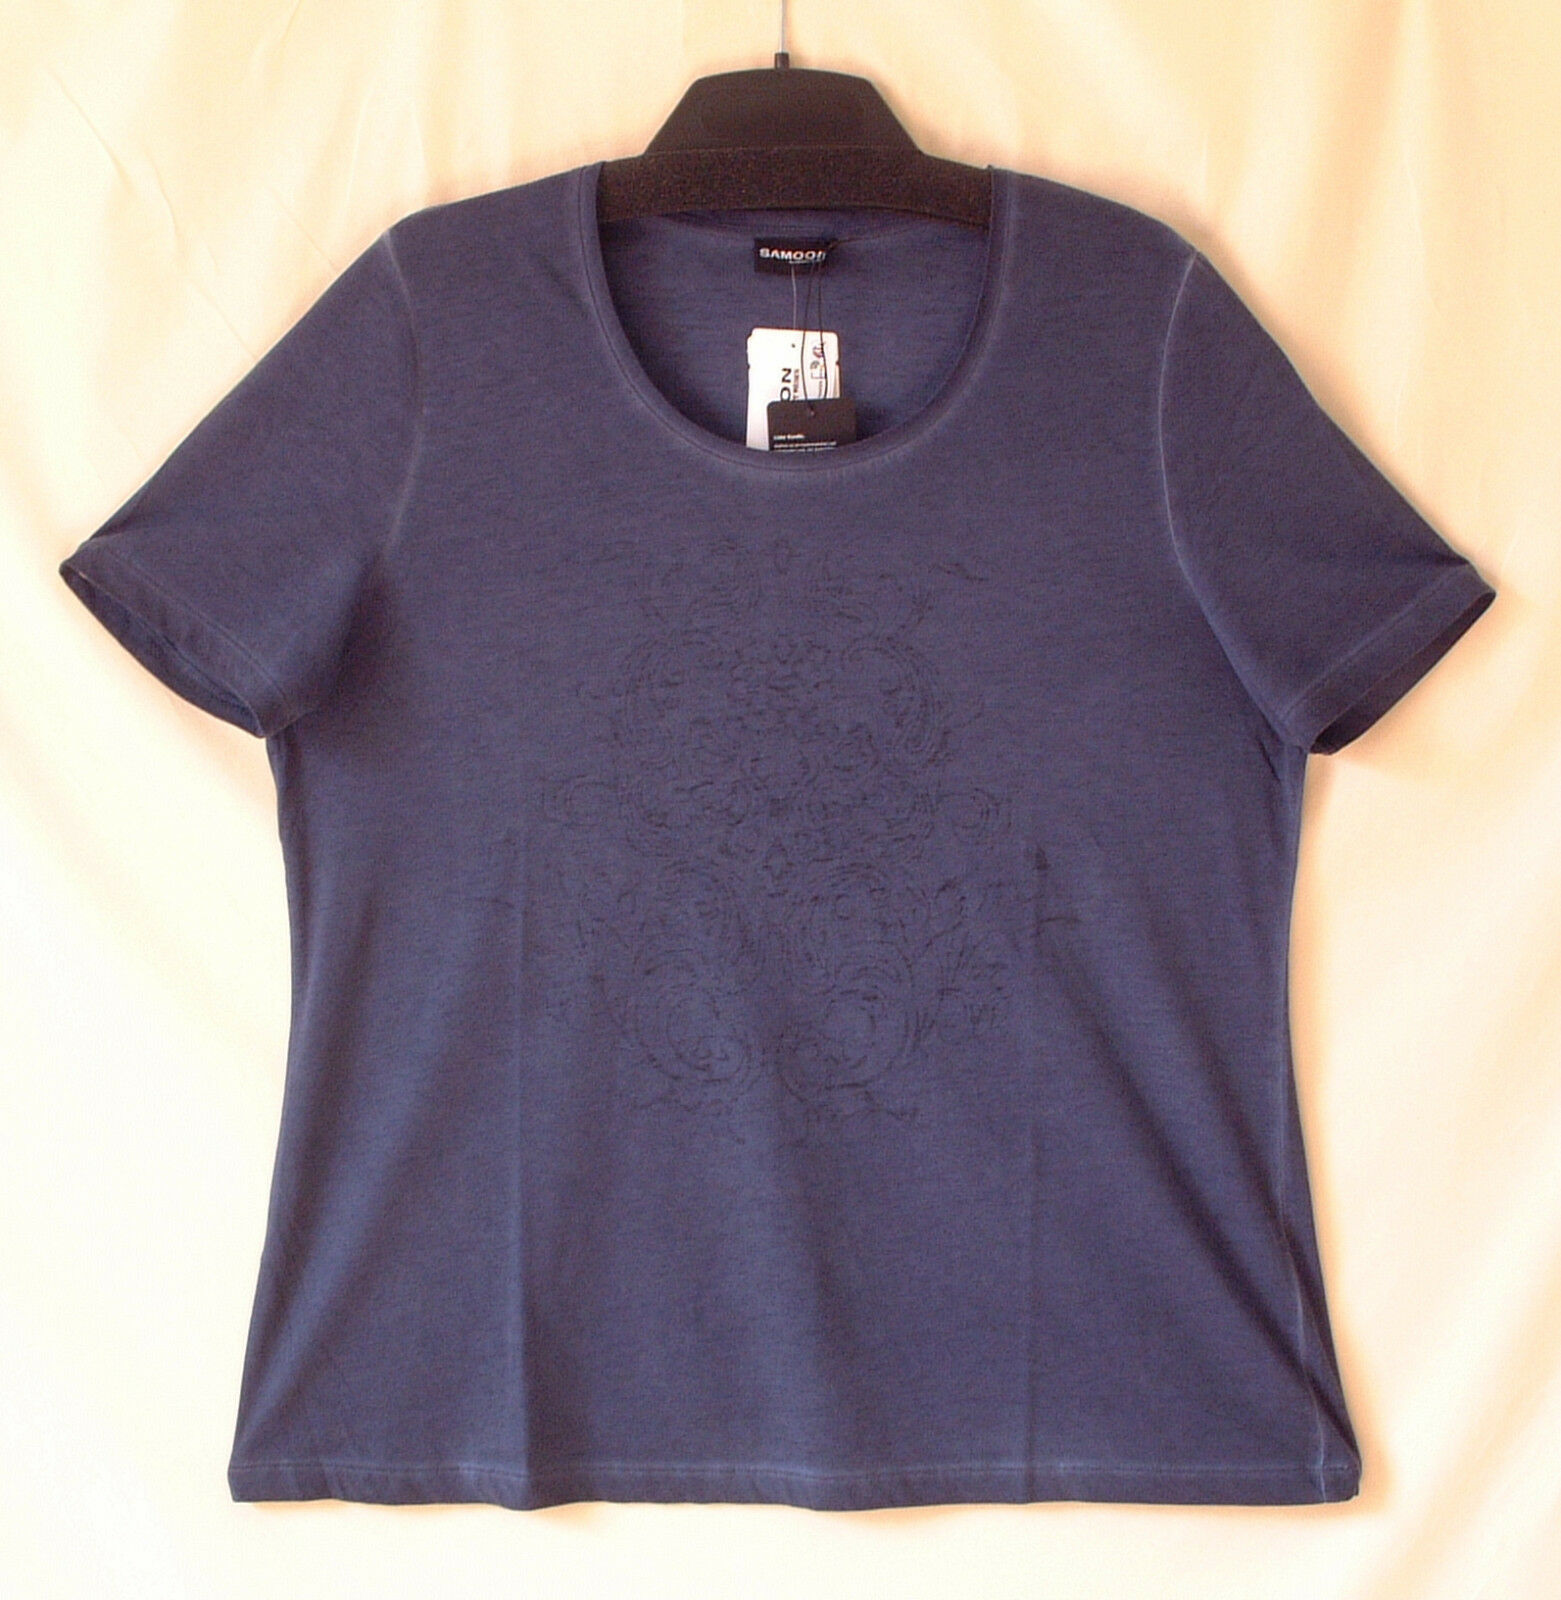 Samoon Shirt Gerry Weber blau Feminines Shirt mit Ausbrenner-Motiv Damen Gr.54